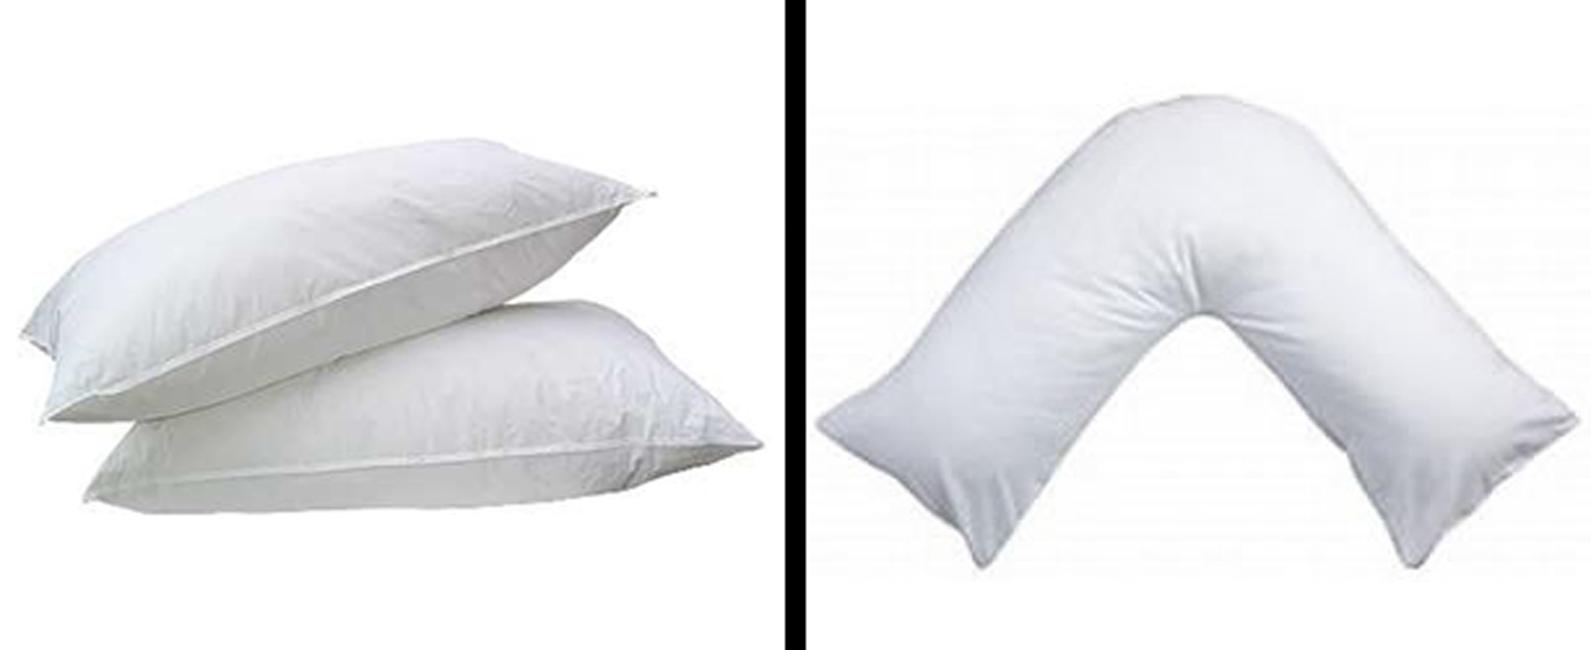 pillows super bounce back v pillow uk new single twin 4. Black Bedroom Furniture Sets. Home Design Ideas